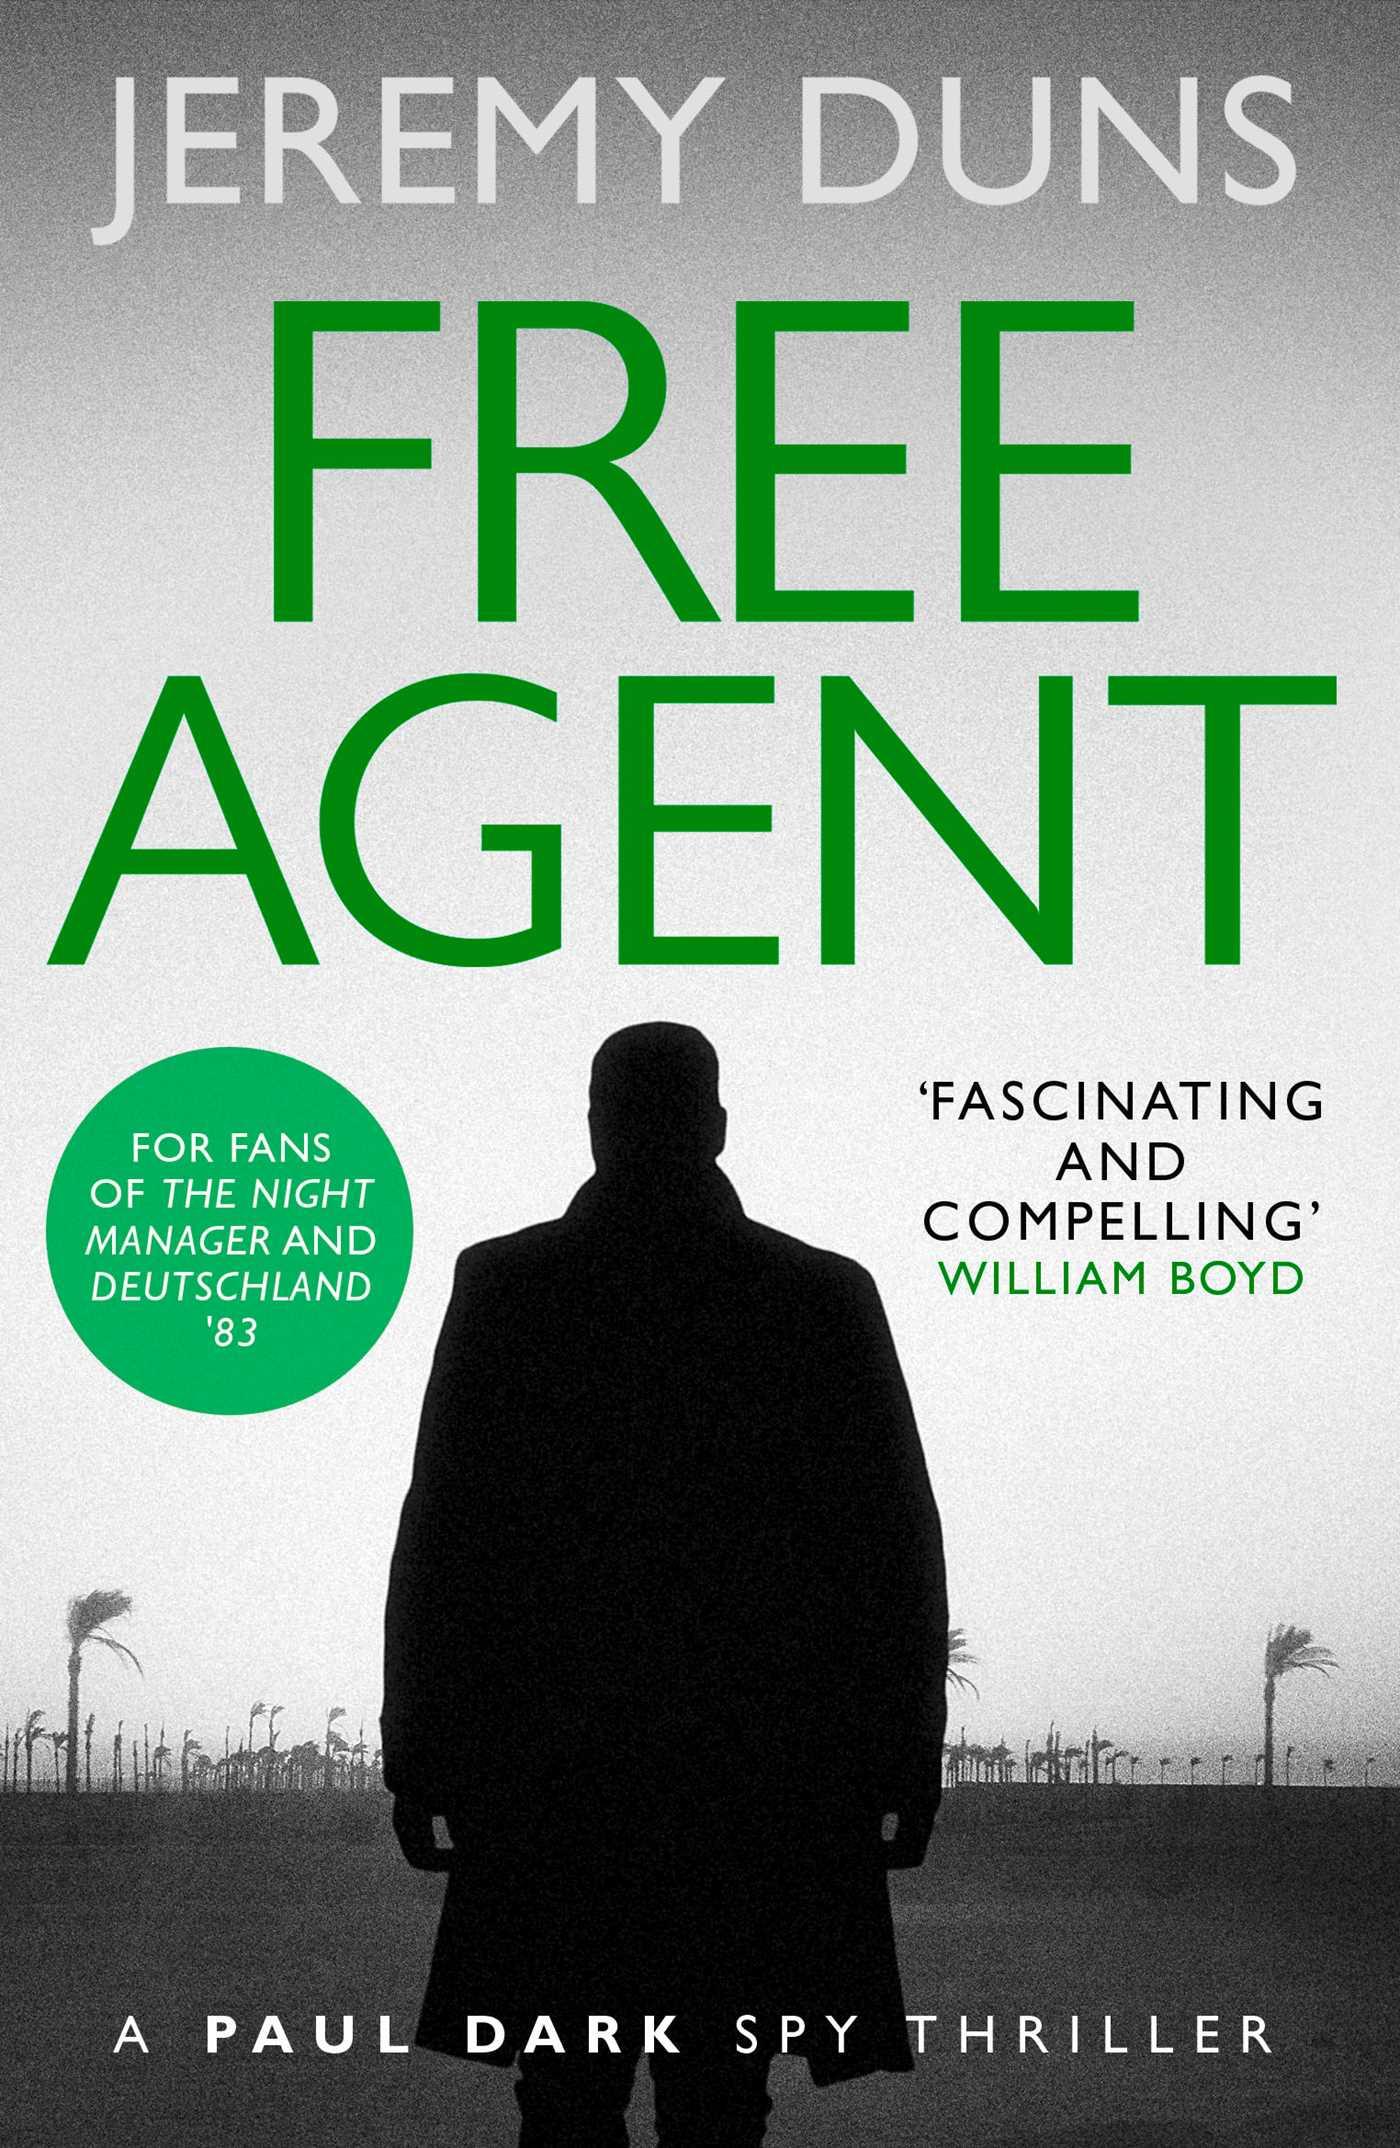 free-agent-paul-dark-1-9781847377364_hr.jpg